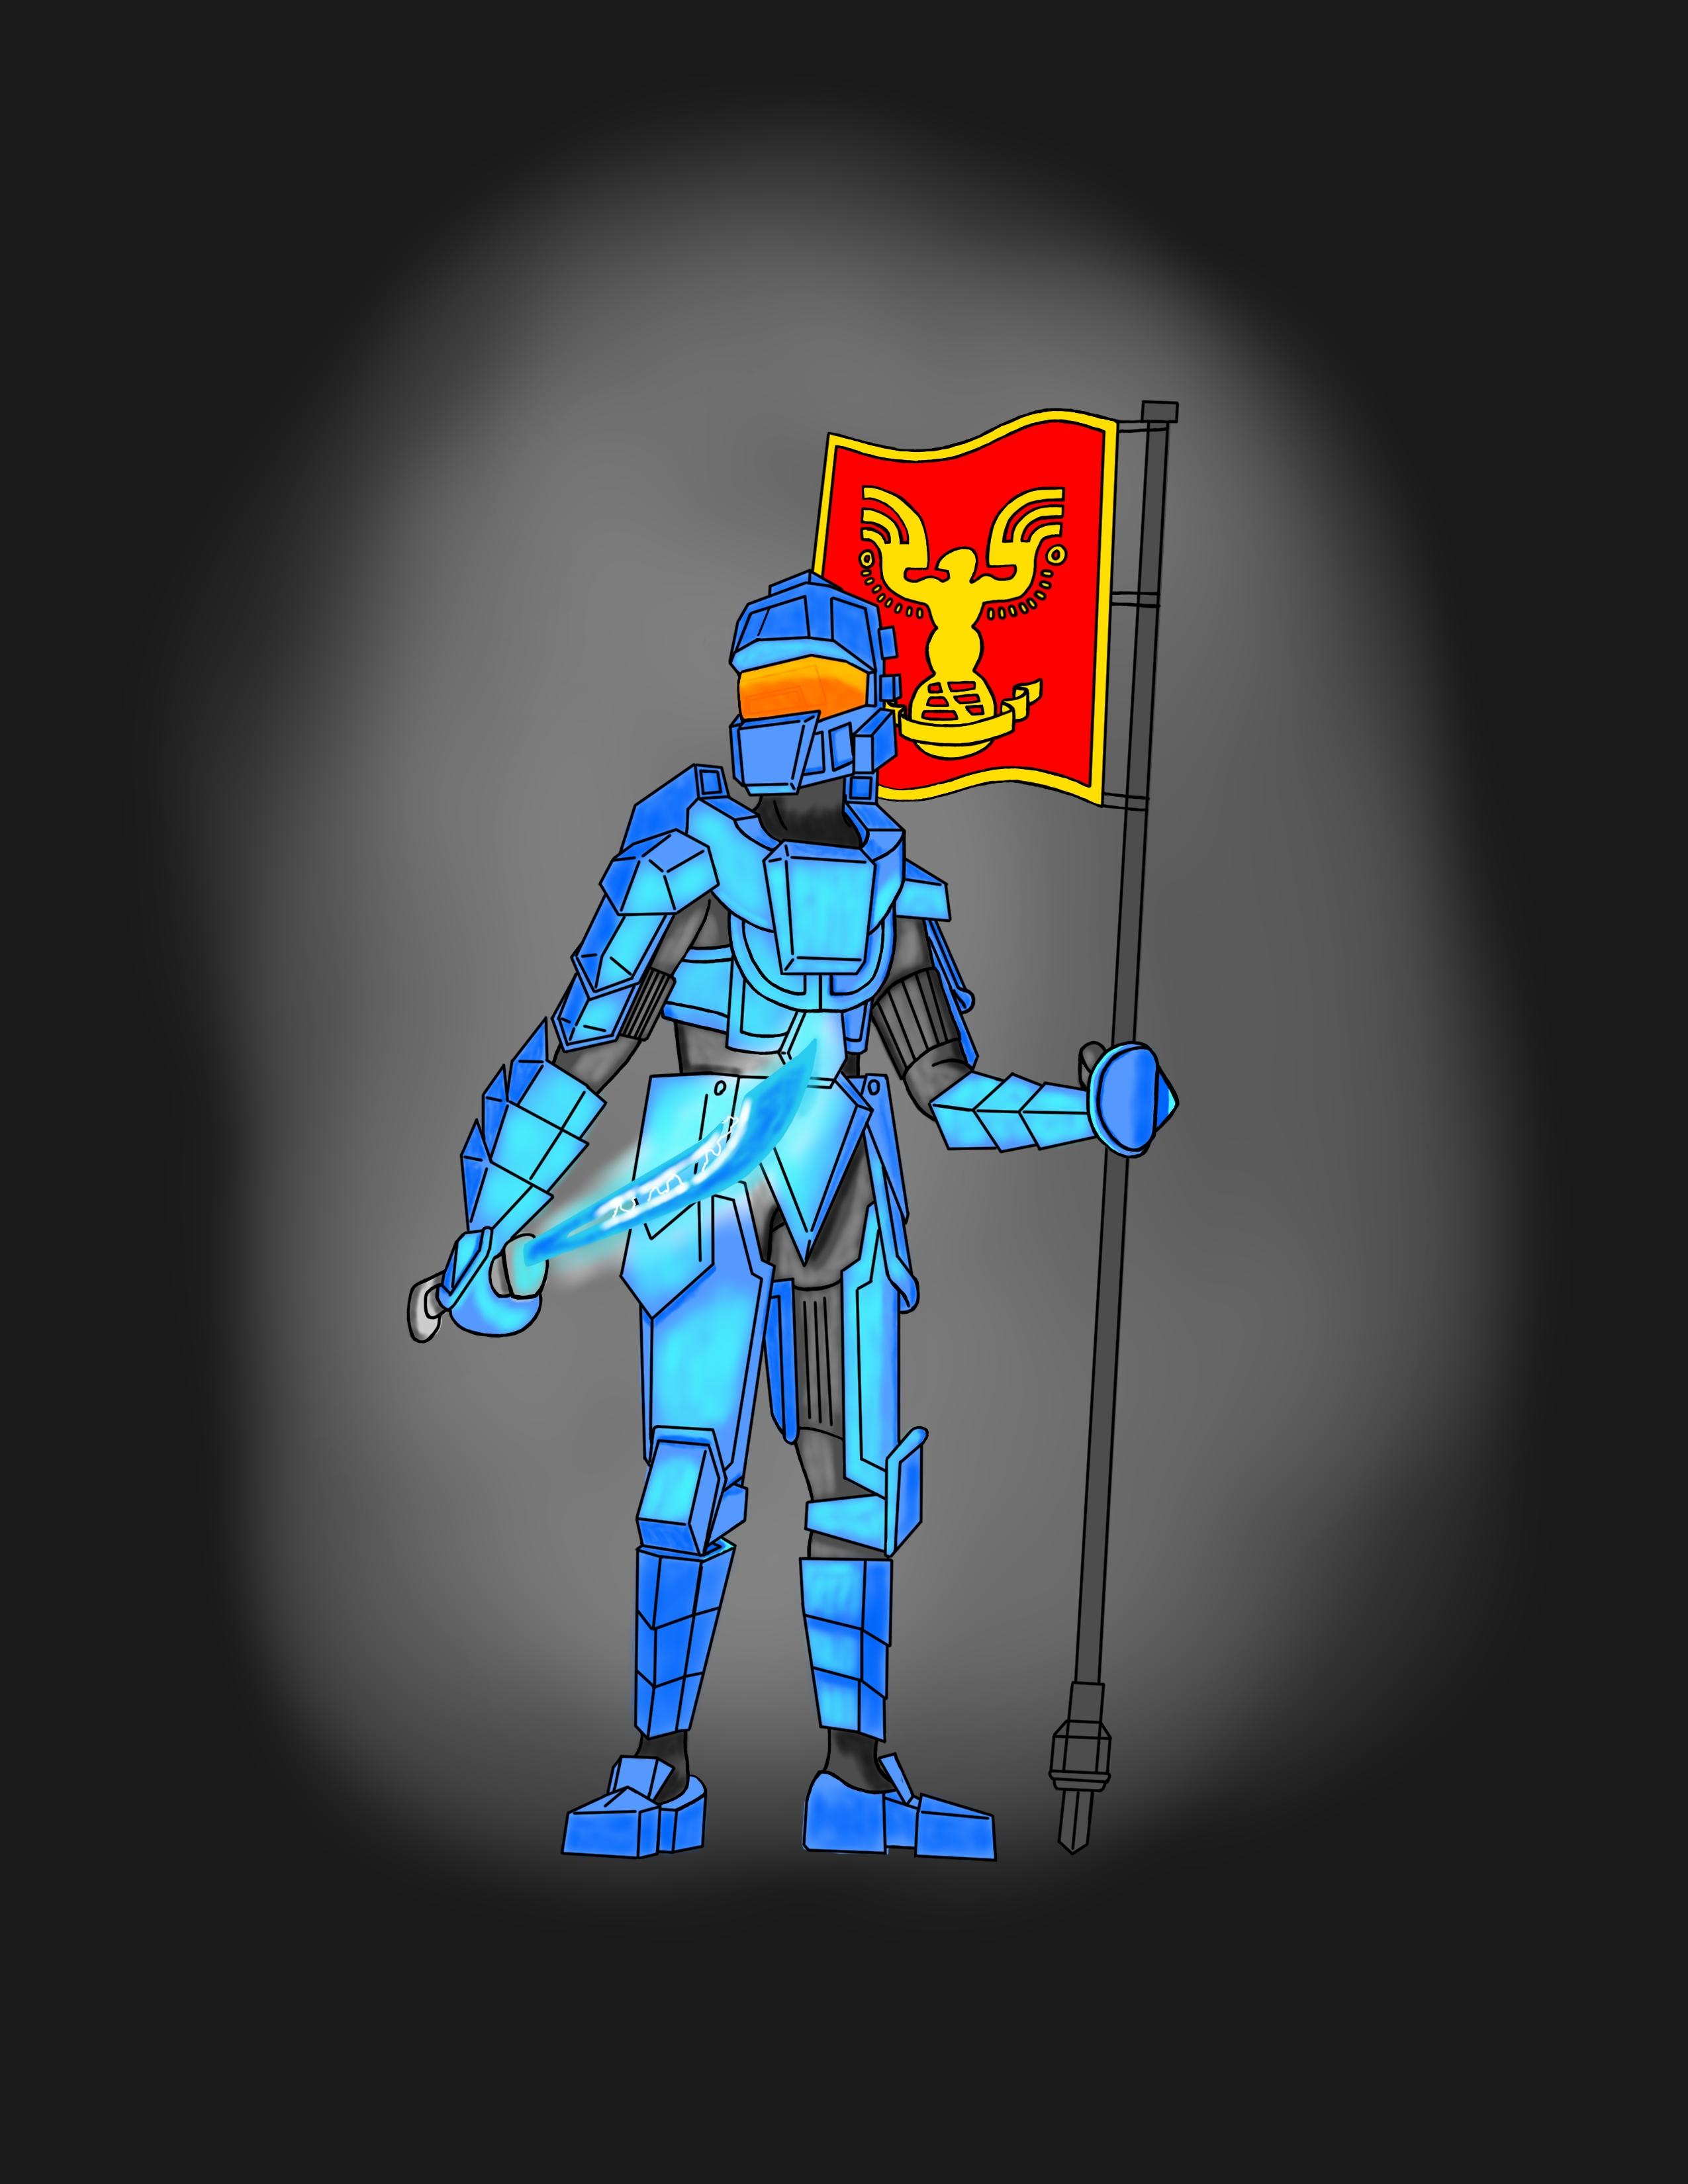 Samurai Spartan (Halo)